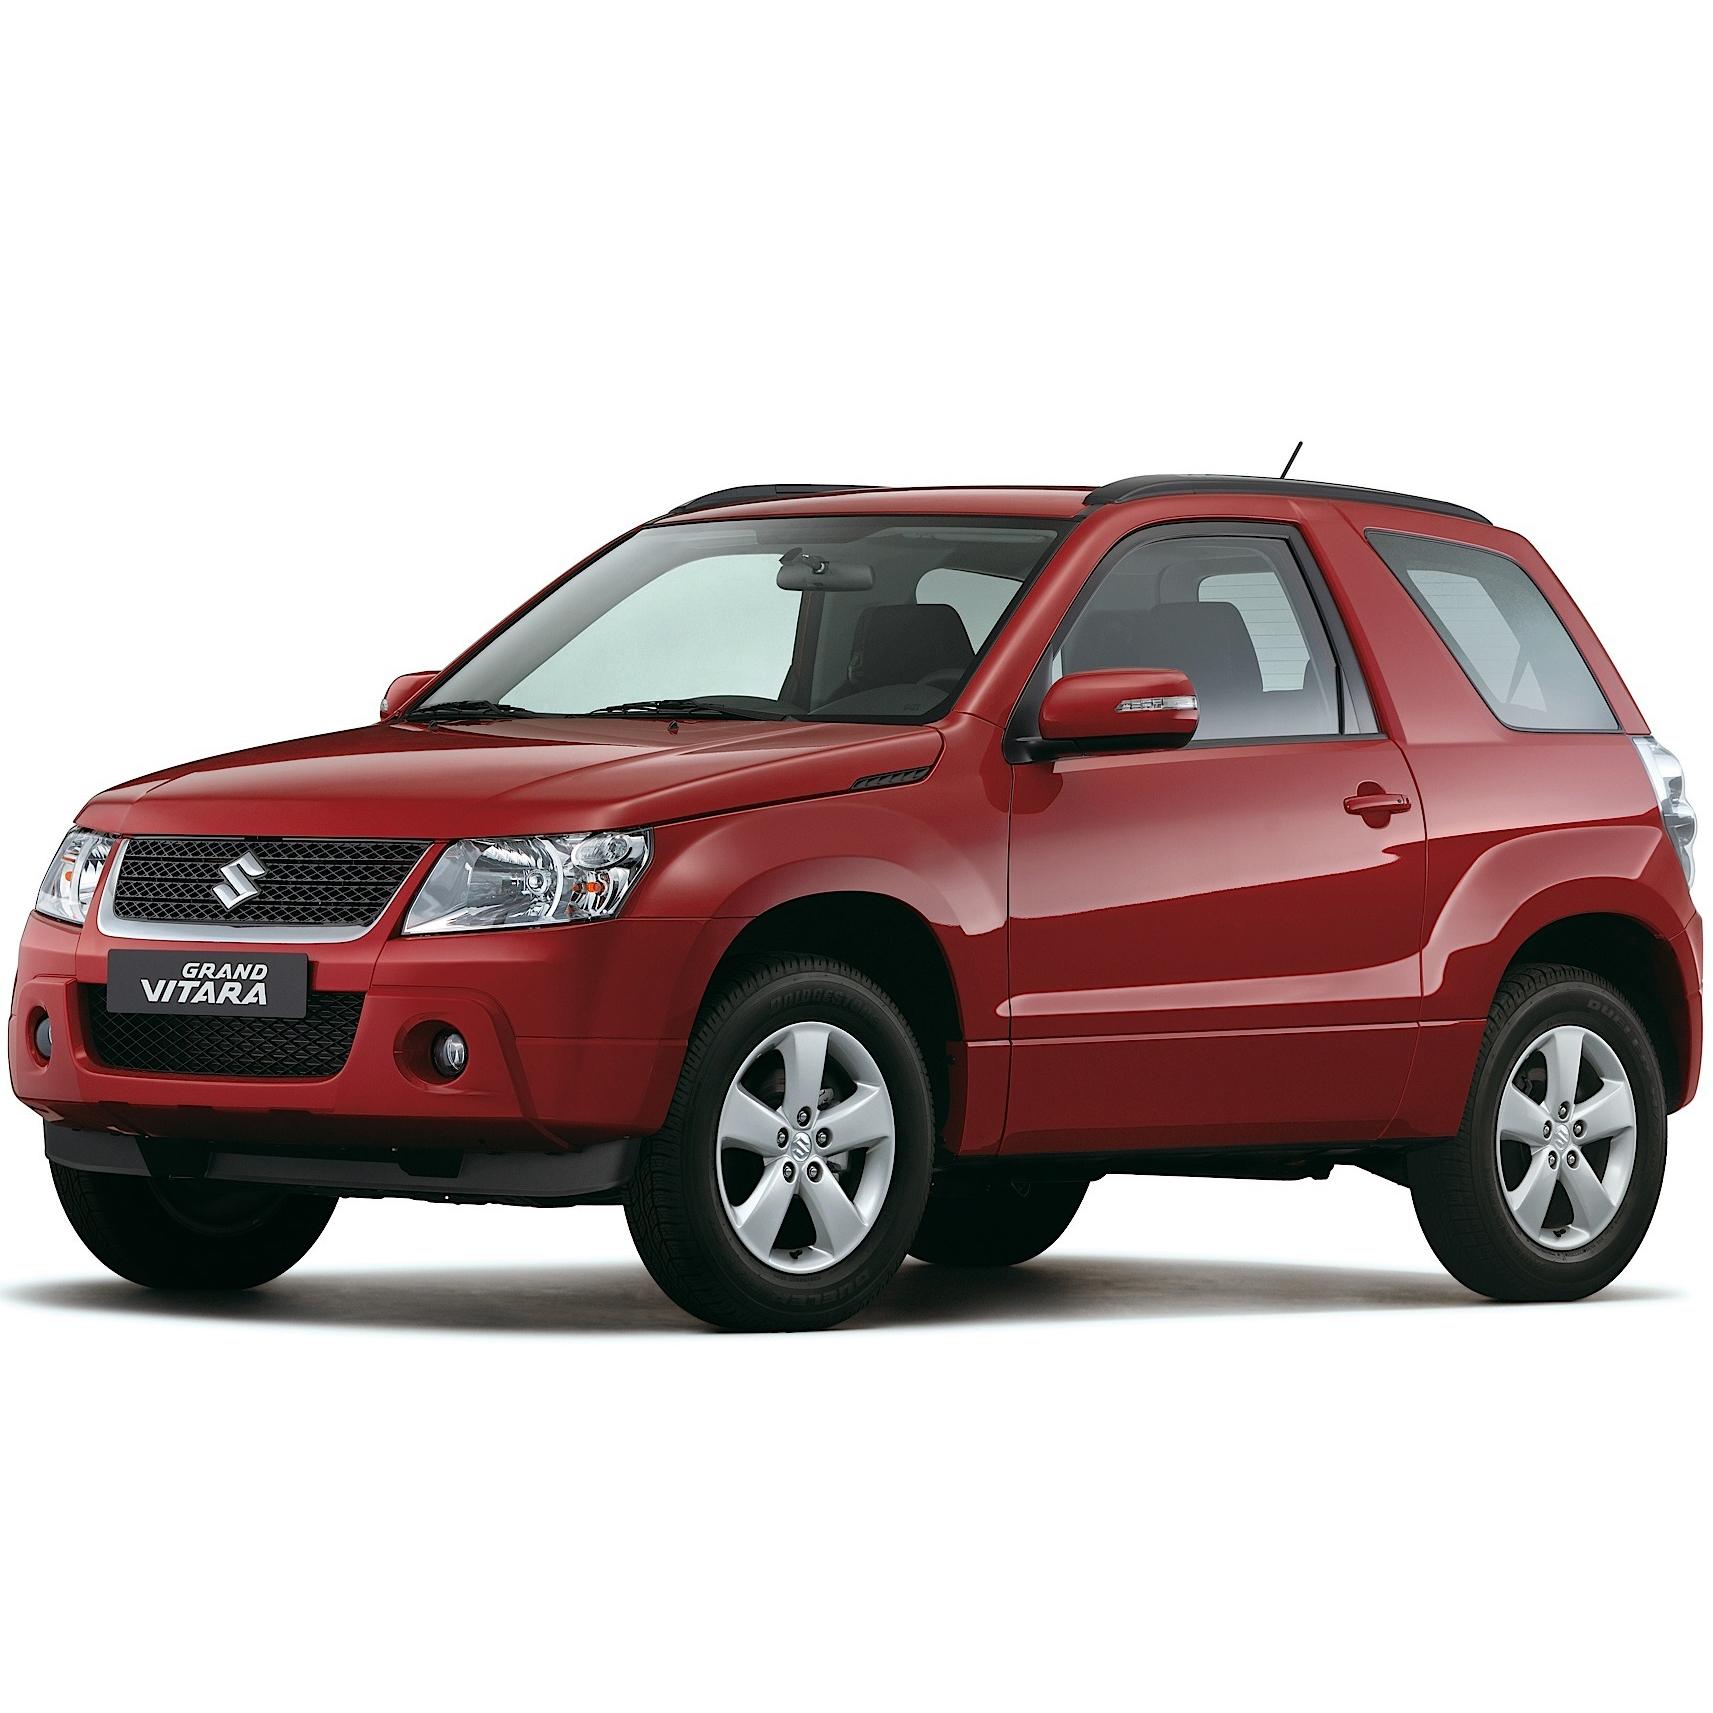 Suzuki Grand Vitara (3 door) 2005 Onwards